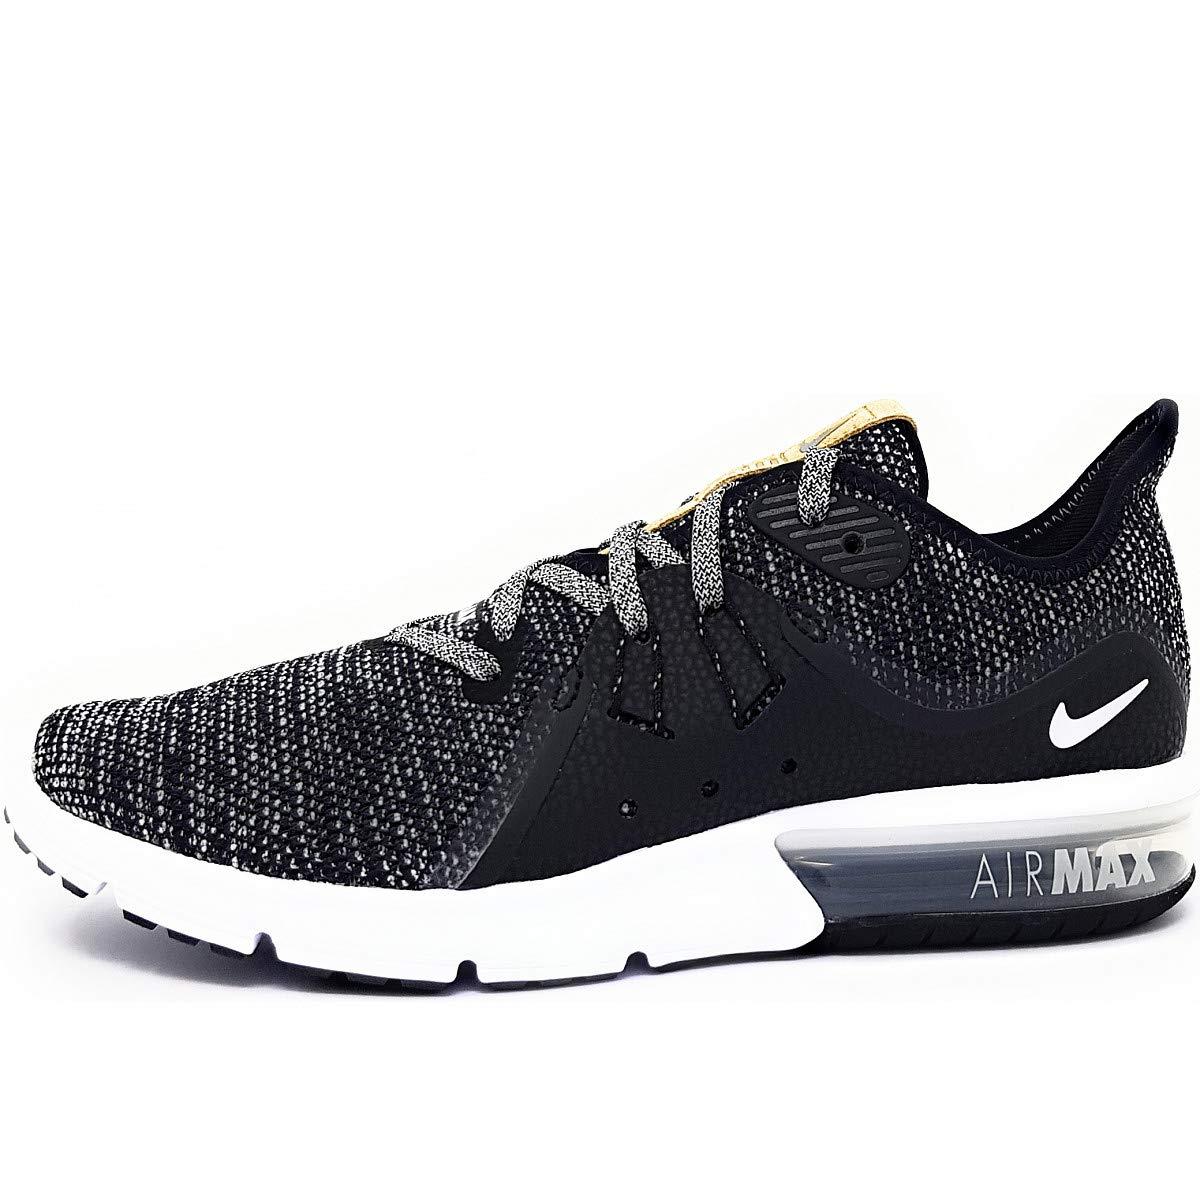 Nike Air MAX Sequent 3 Zapatillas de Correr para Mujer: Nike